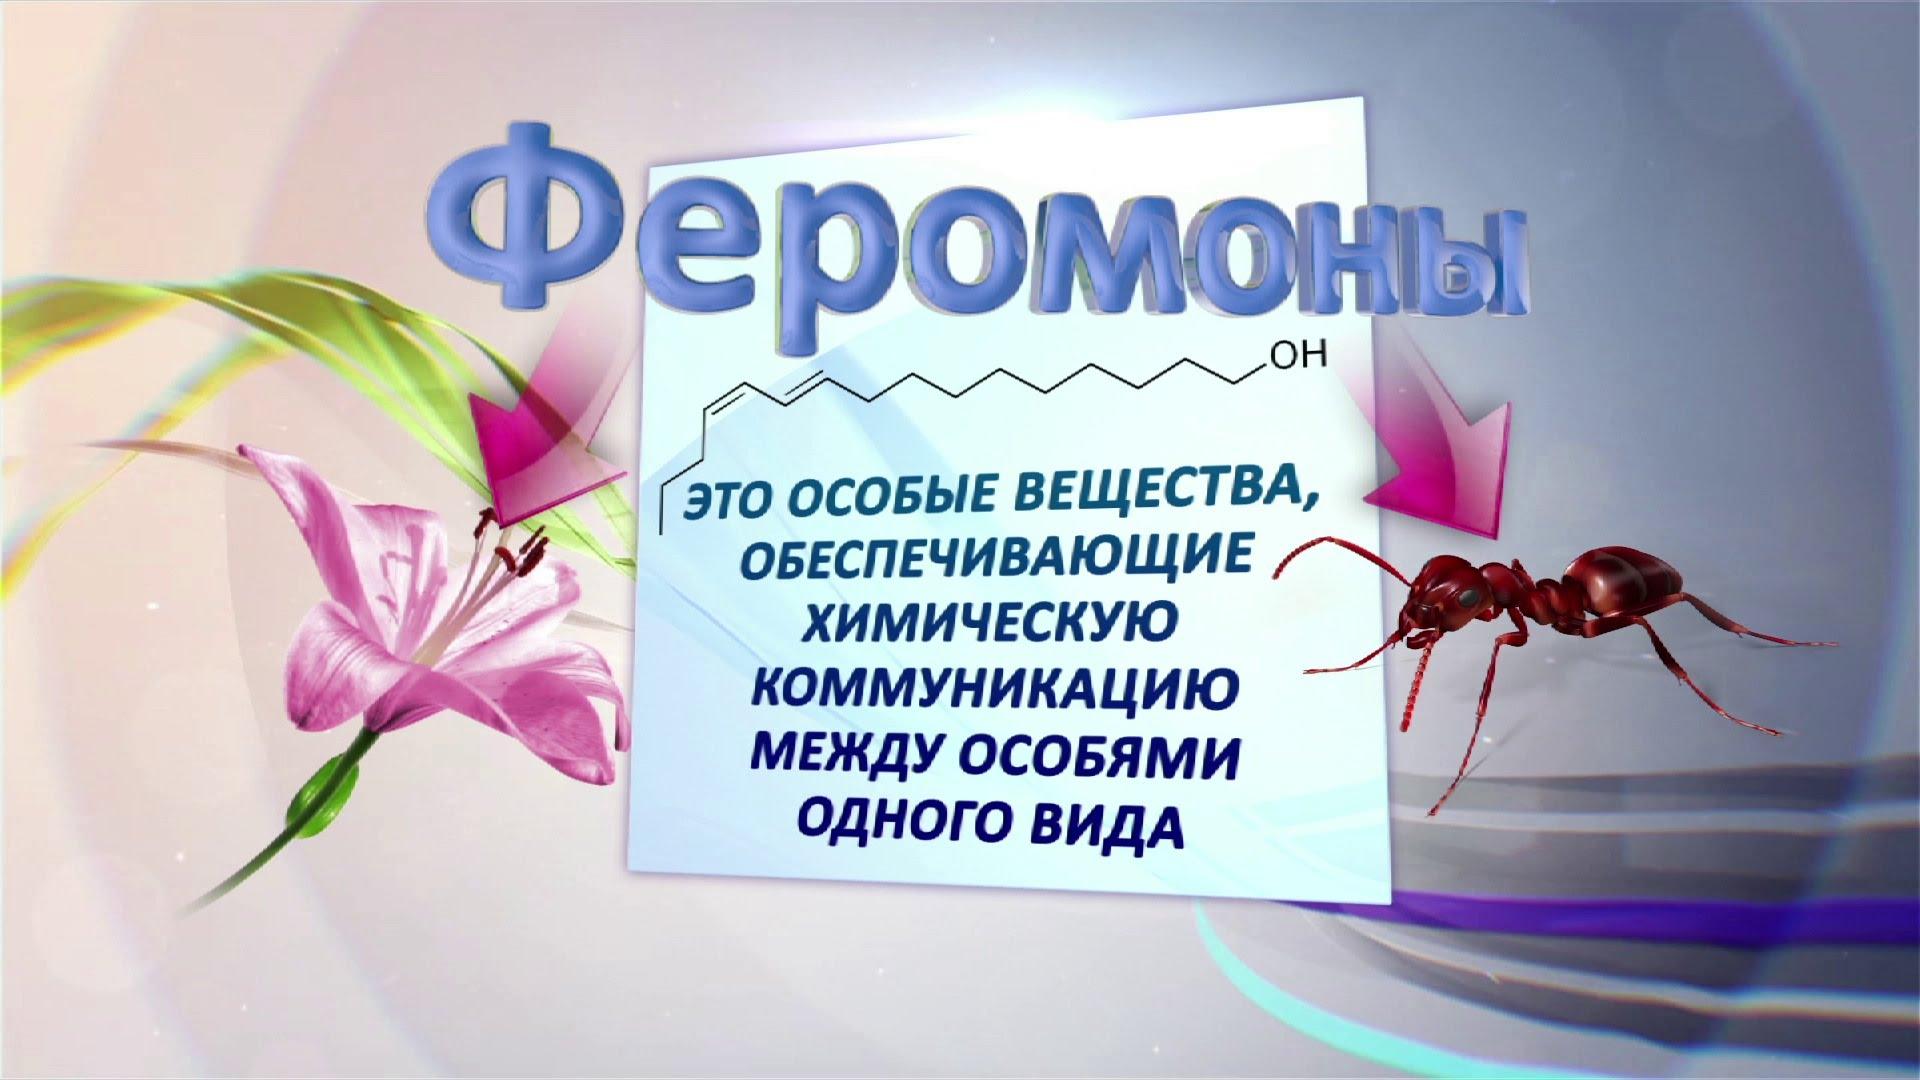 Духи с феромонами. правда или ложь? | wmj.ru